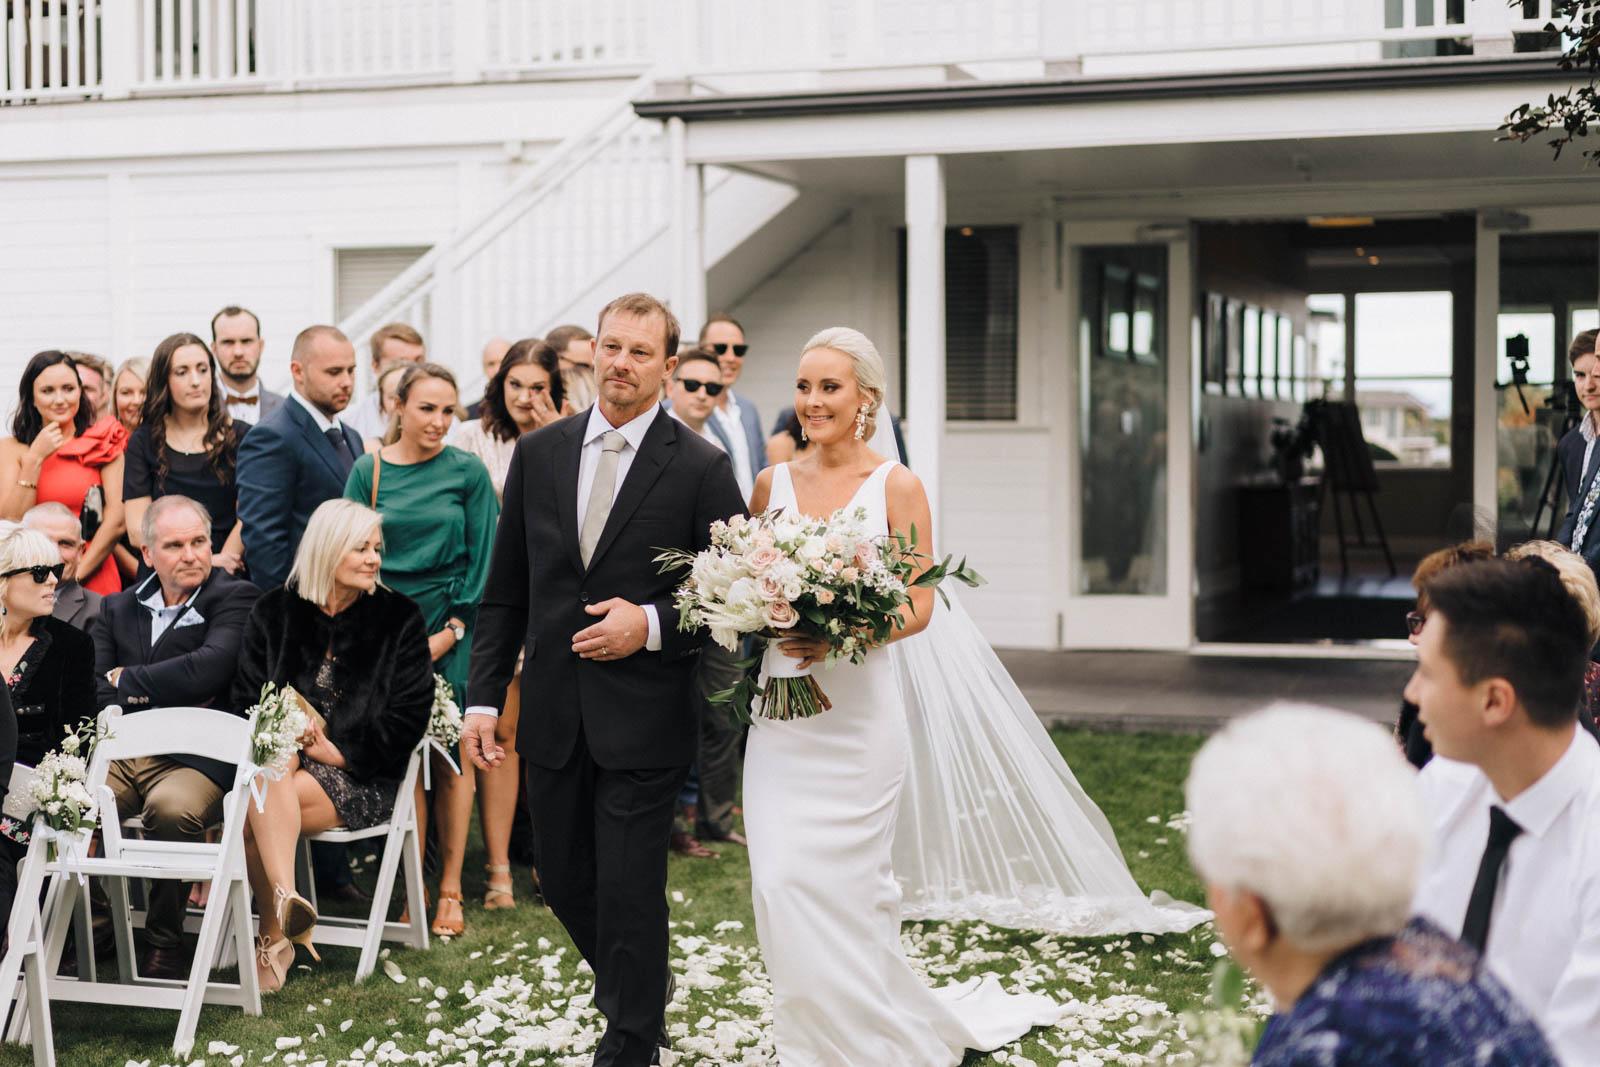 newfound-k-s-hilton-taupo-wedding-photographer-029